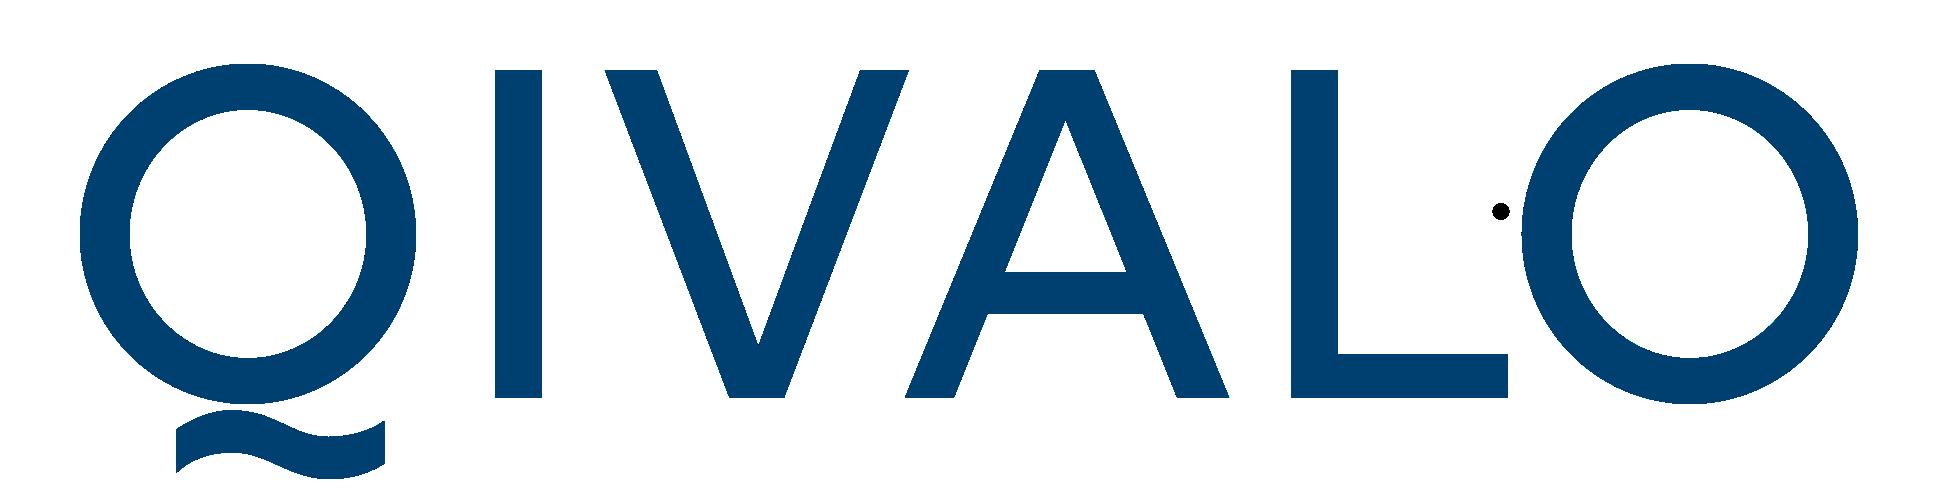 qivalo logo